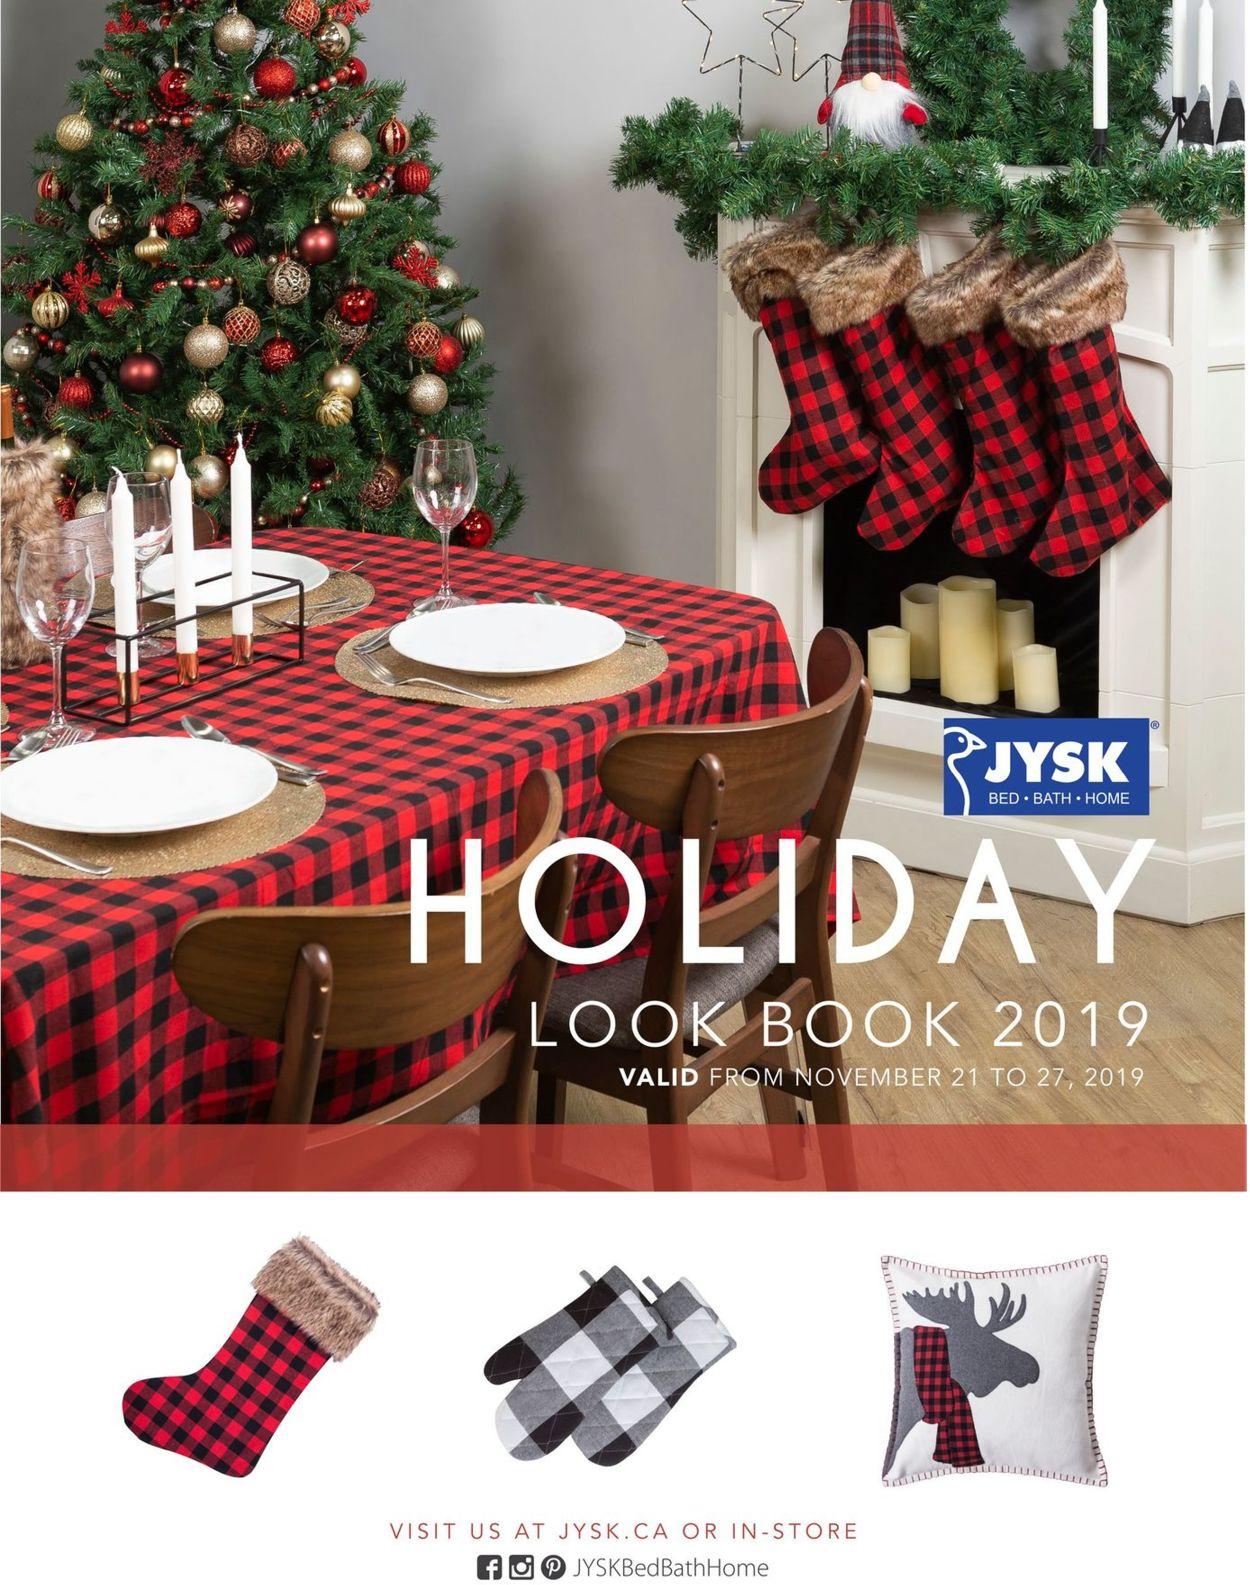 JYSK HOLIDAY LOOKBOOK 2019 Flyer - 11/21-11/27/2019